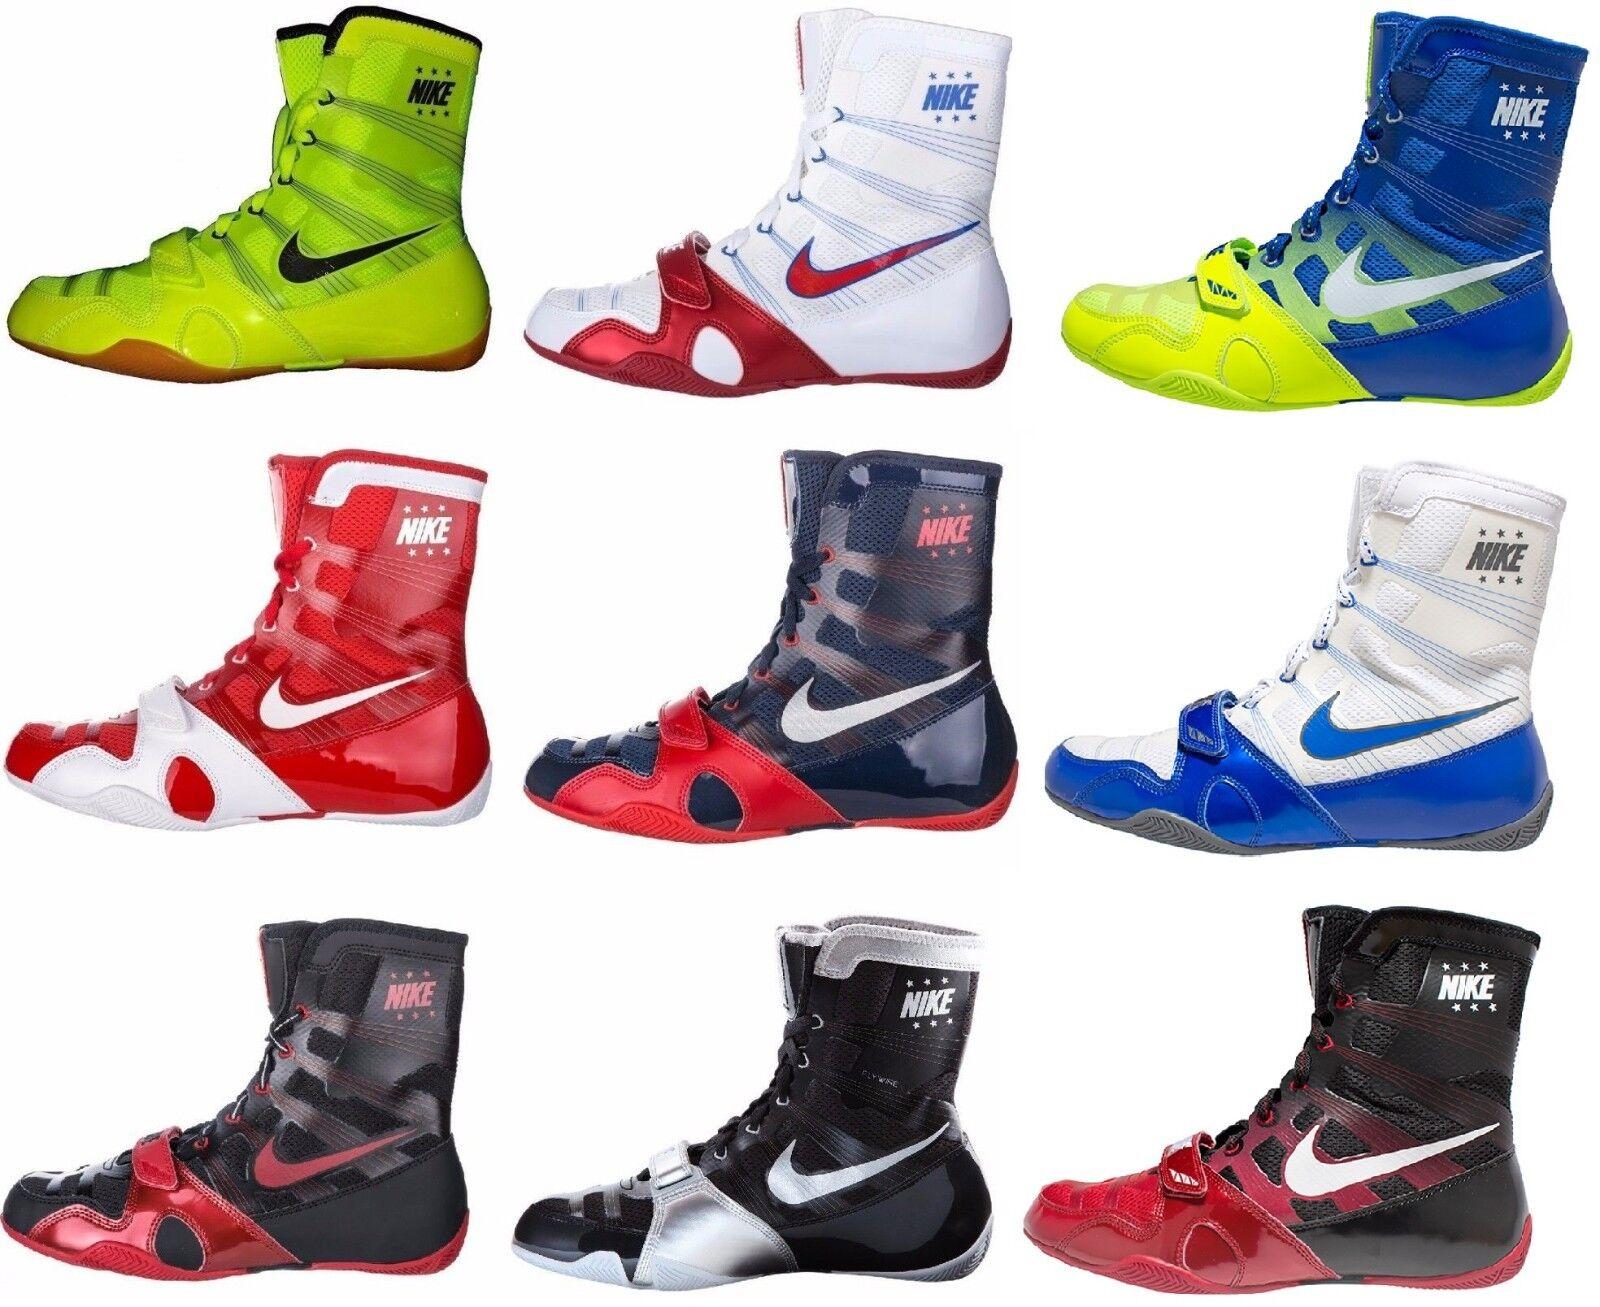 Nike HyperKO Dark Grey Black Volt Boxing Shoes